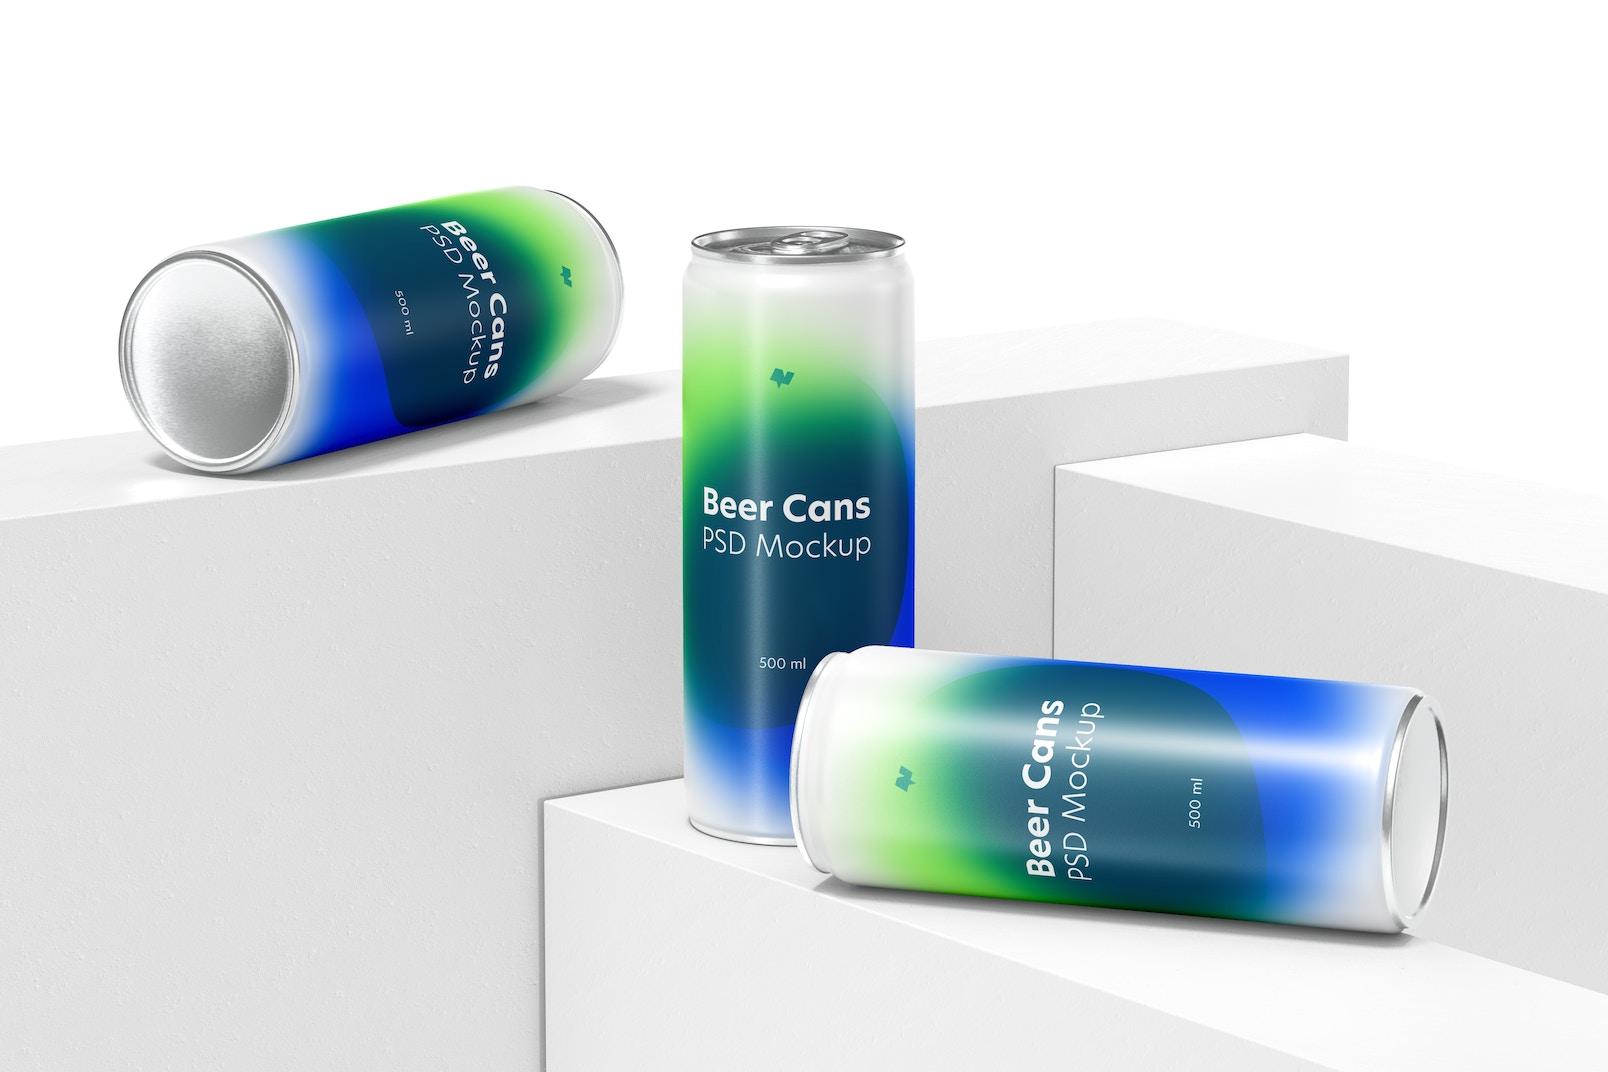 500ml Beer Cans Set Mockup